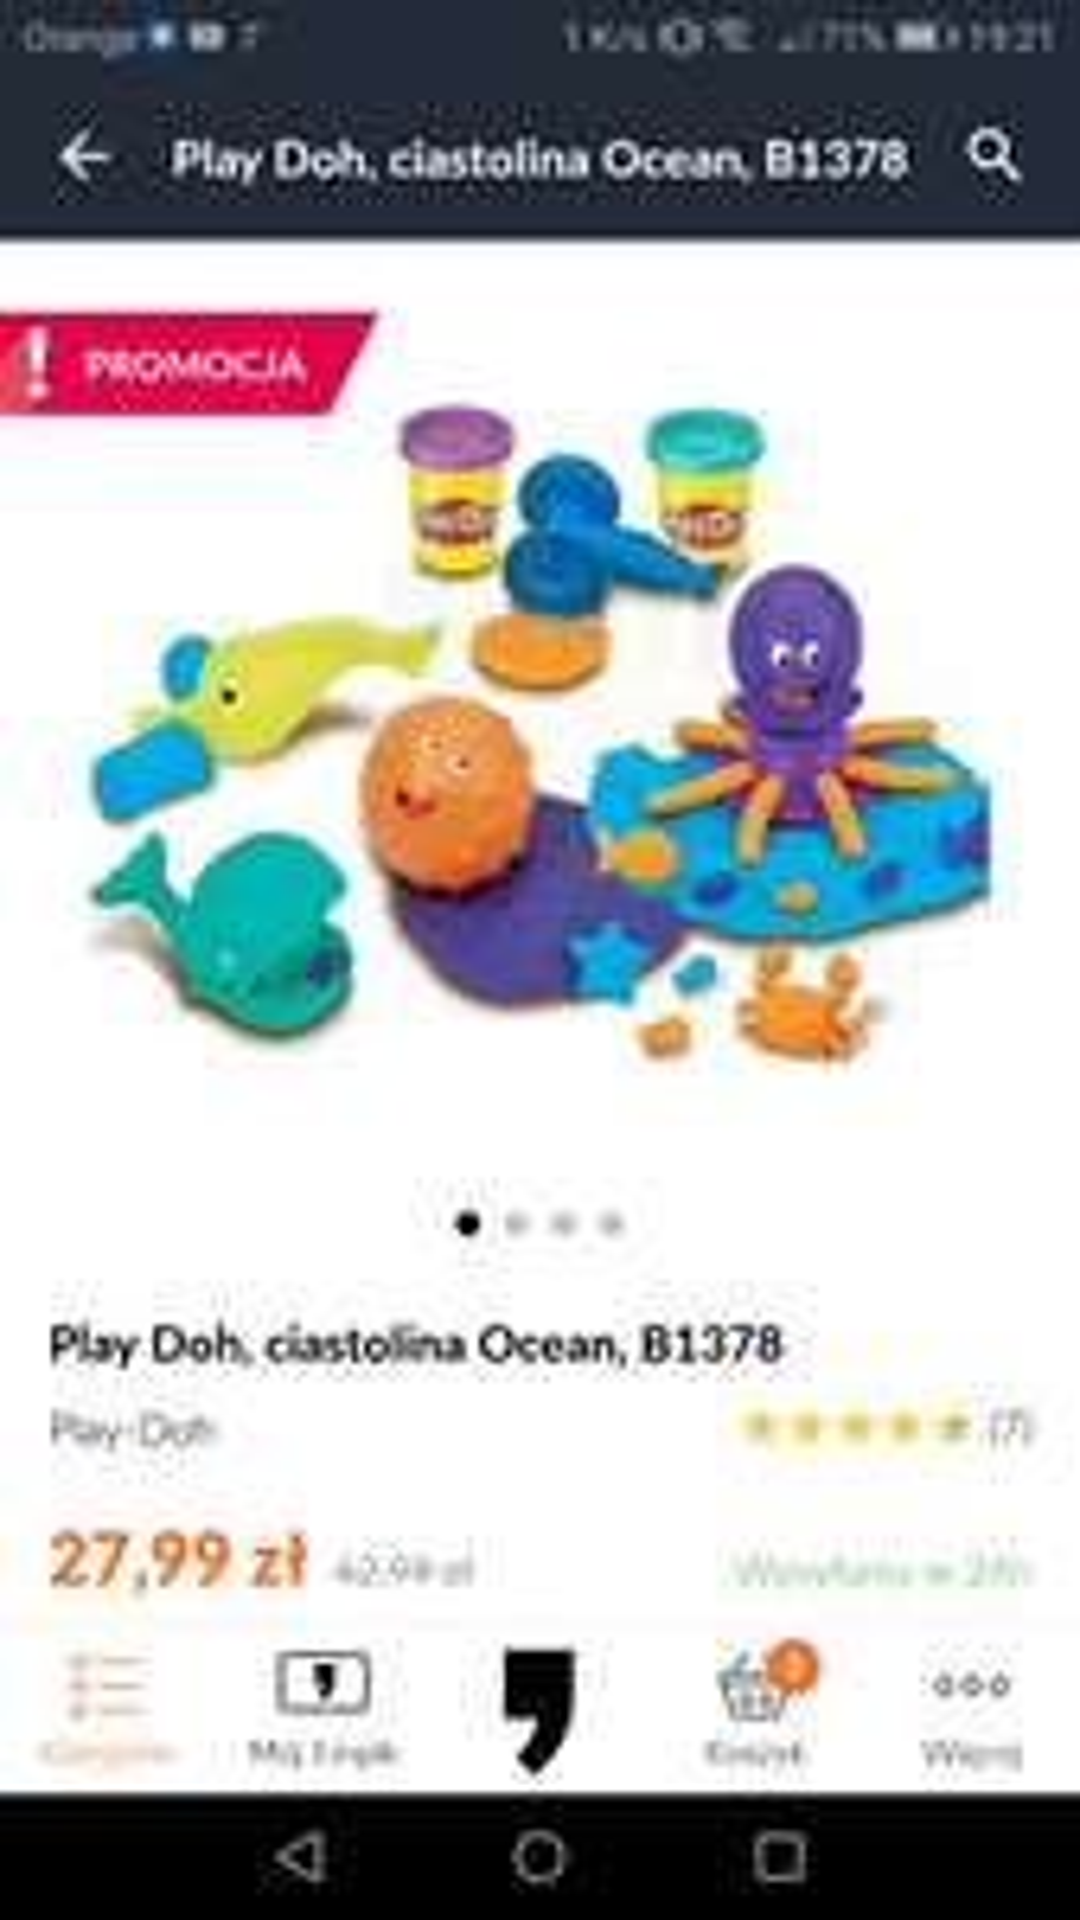 Zestaw Play Doh Ocean Empik